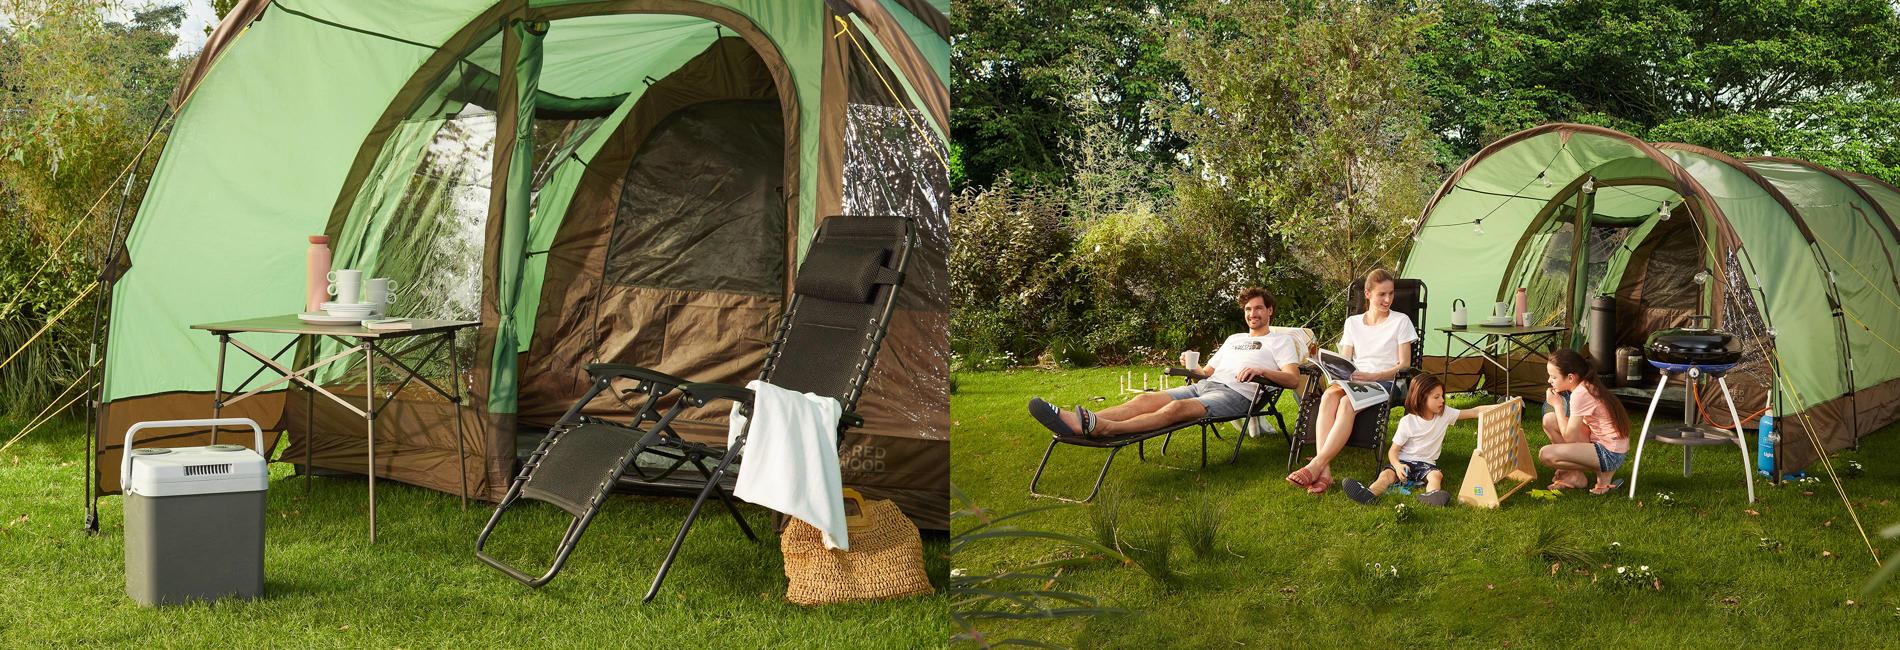 Top teaser - Camping shop